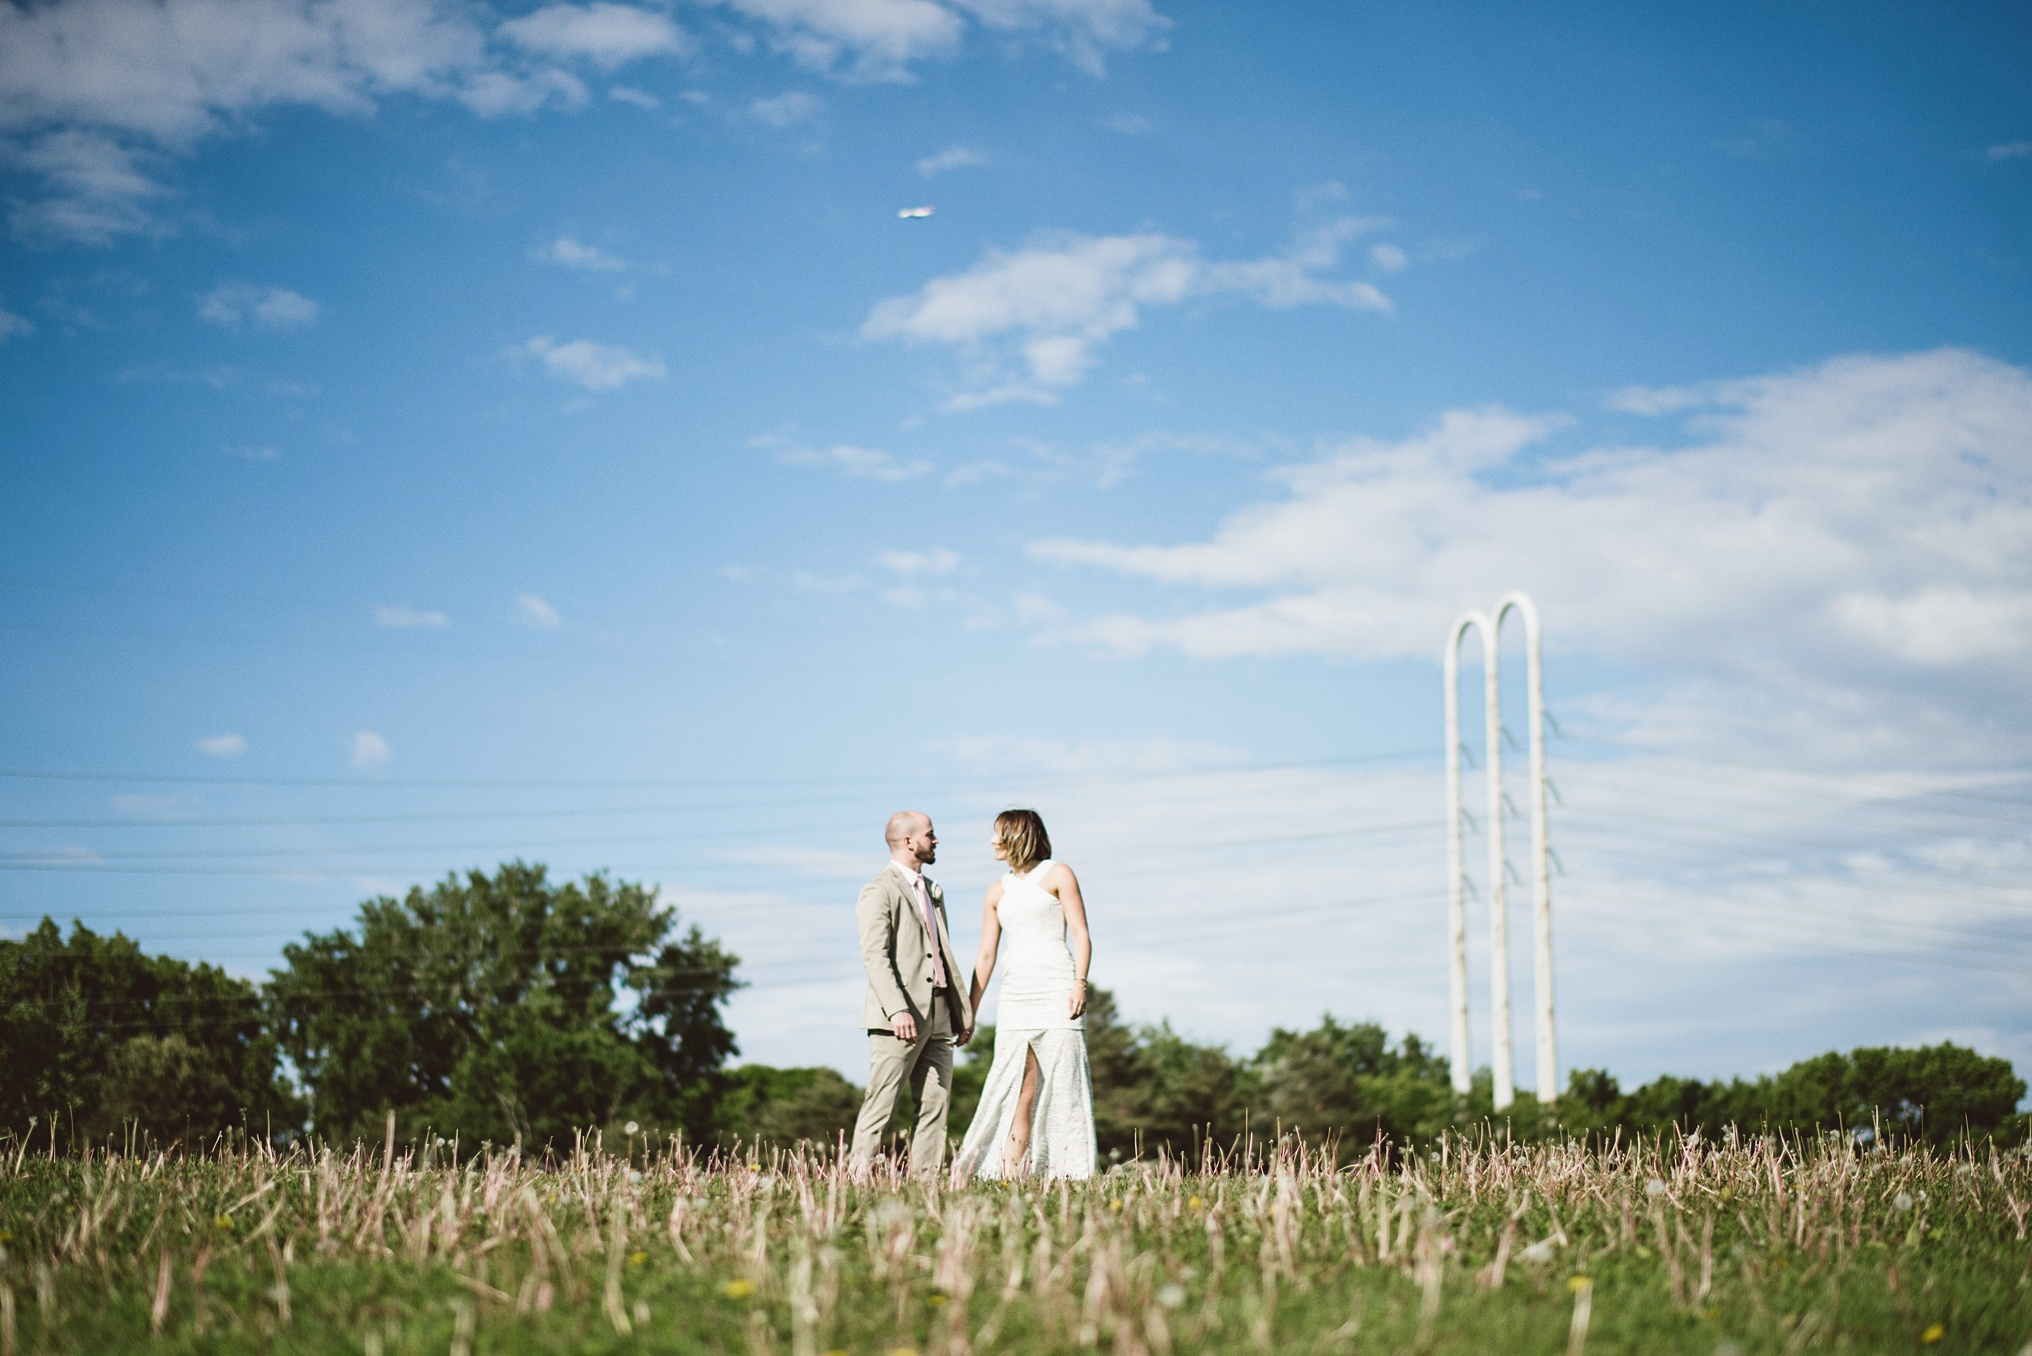 best_wedding_photography_2017_by_lucas_botz_photography_011.jpg